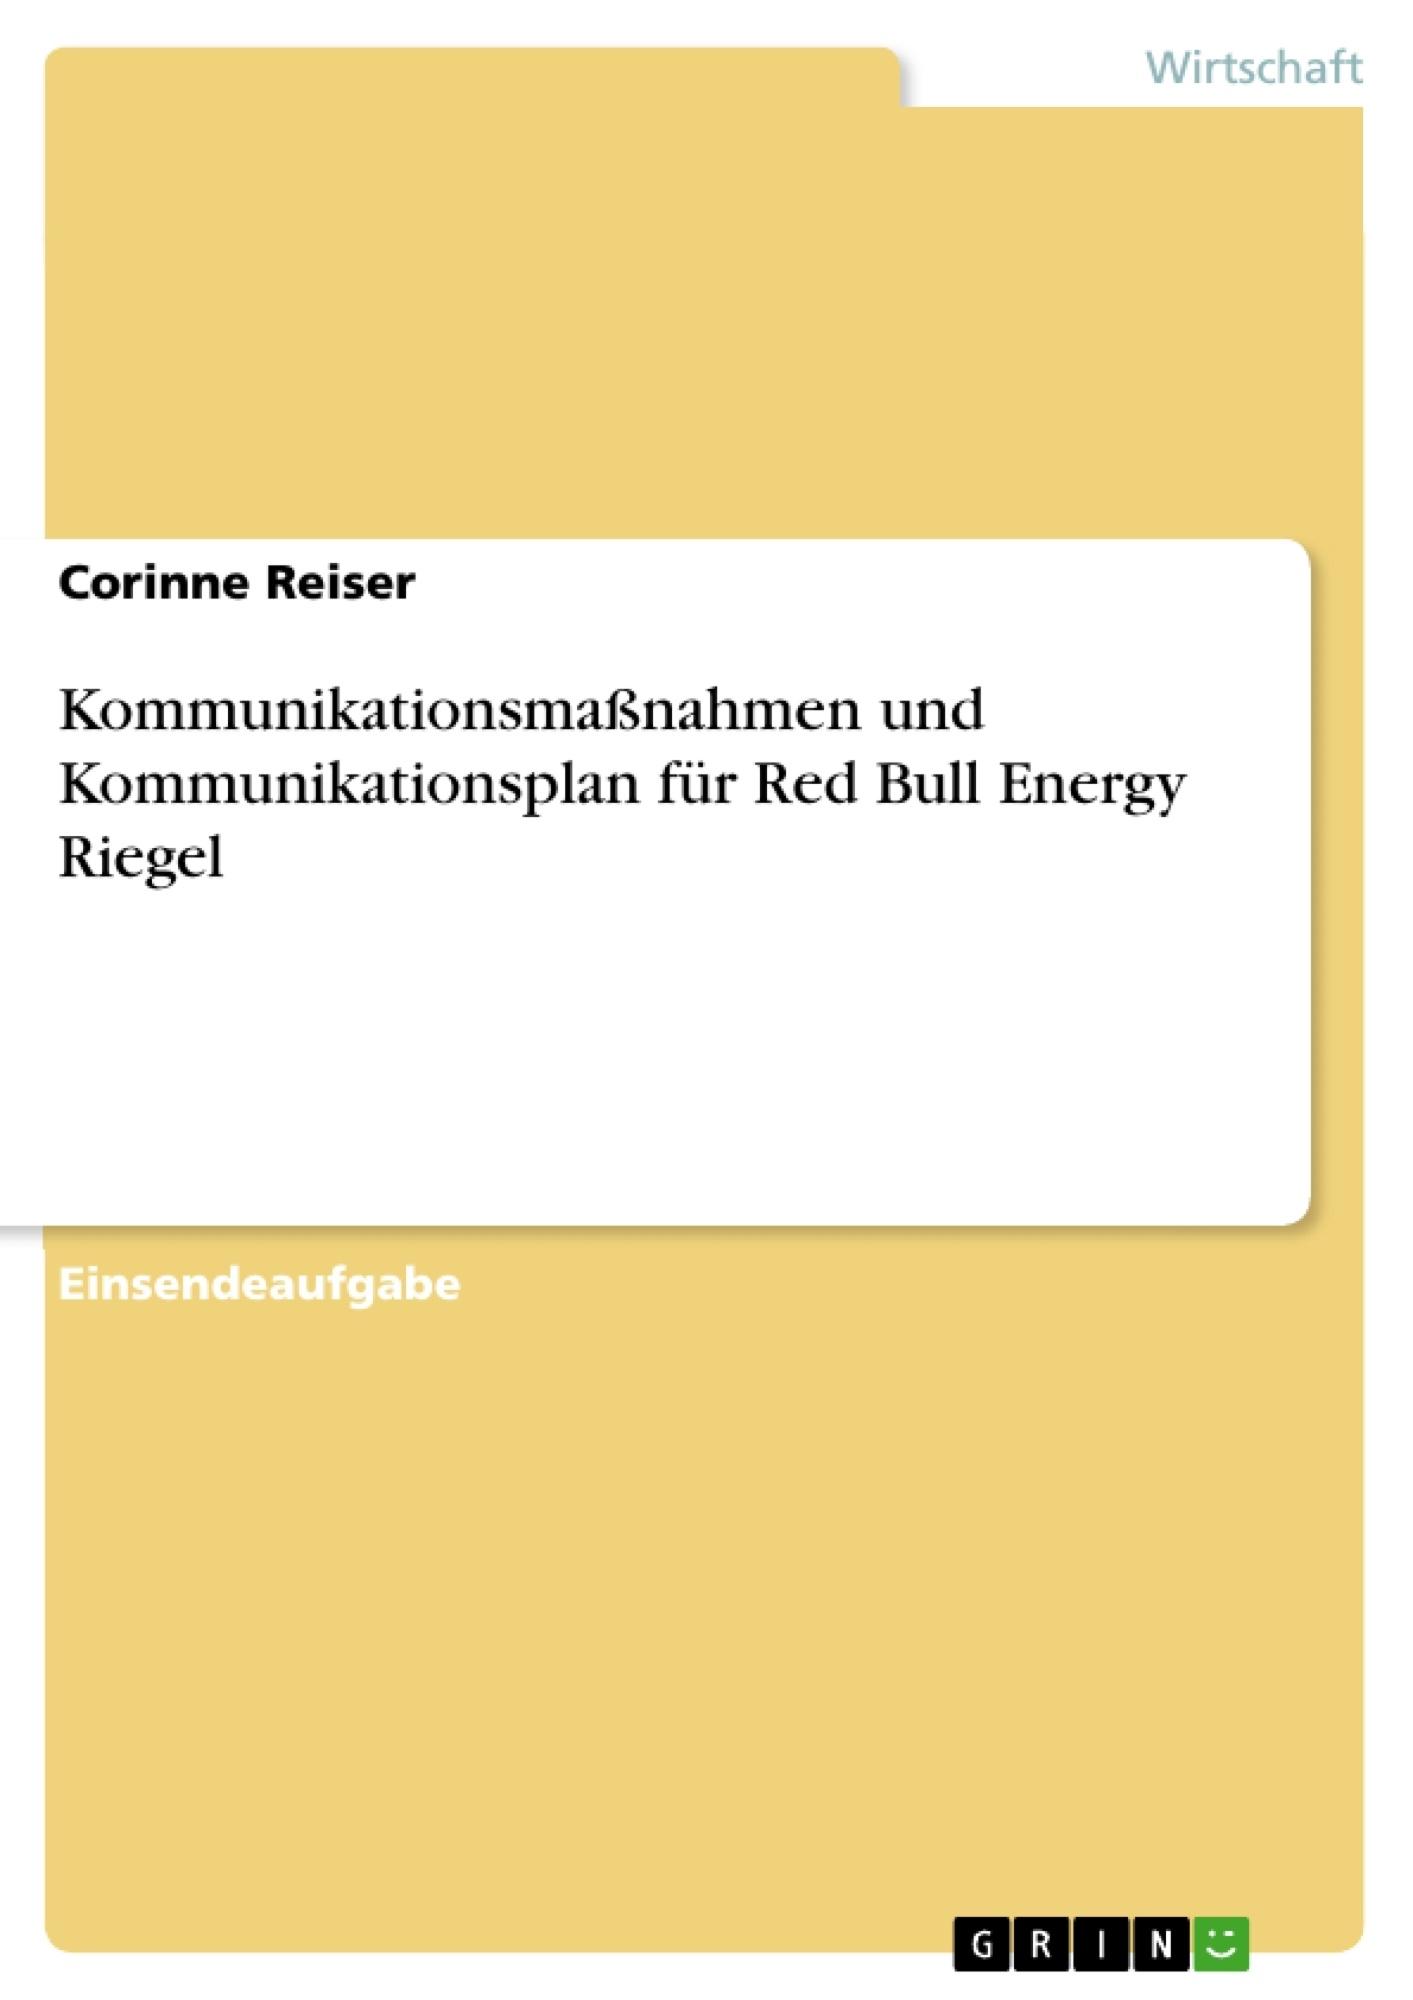 Titel: Kommunikationsmaßnahmen und Kommunikationsplan für Red Bull Energy Riegel